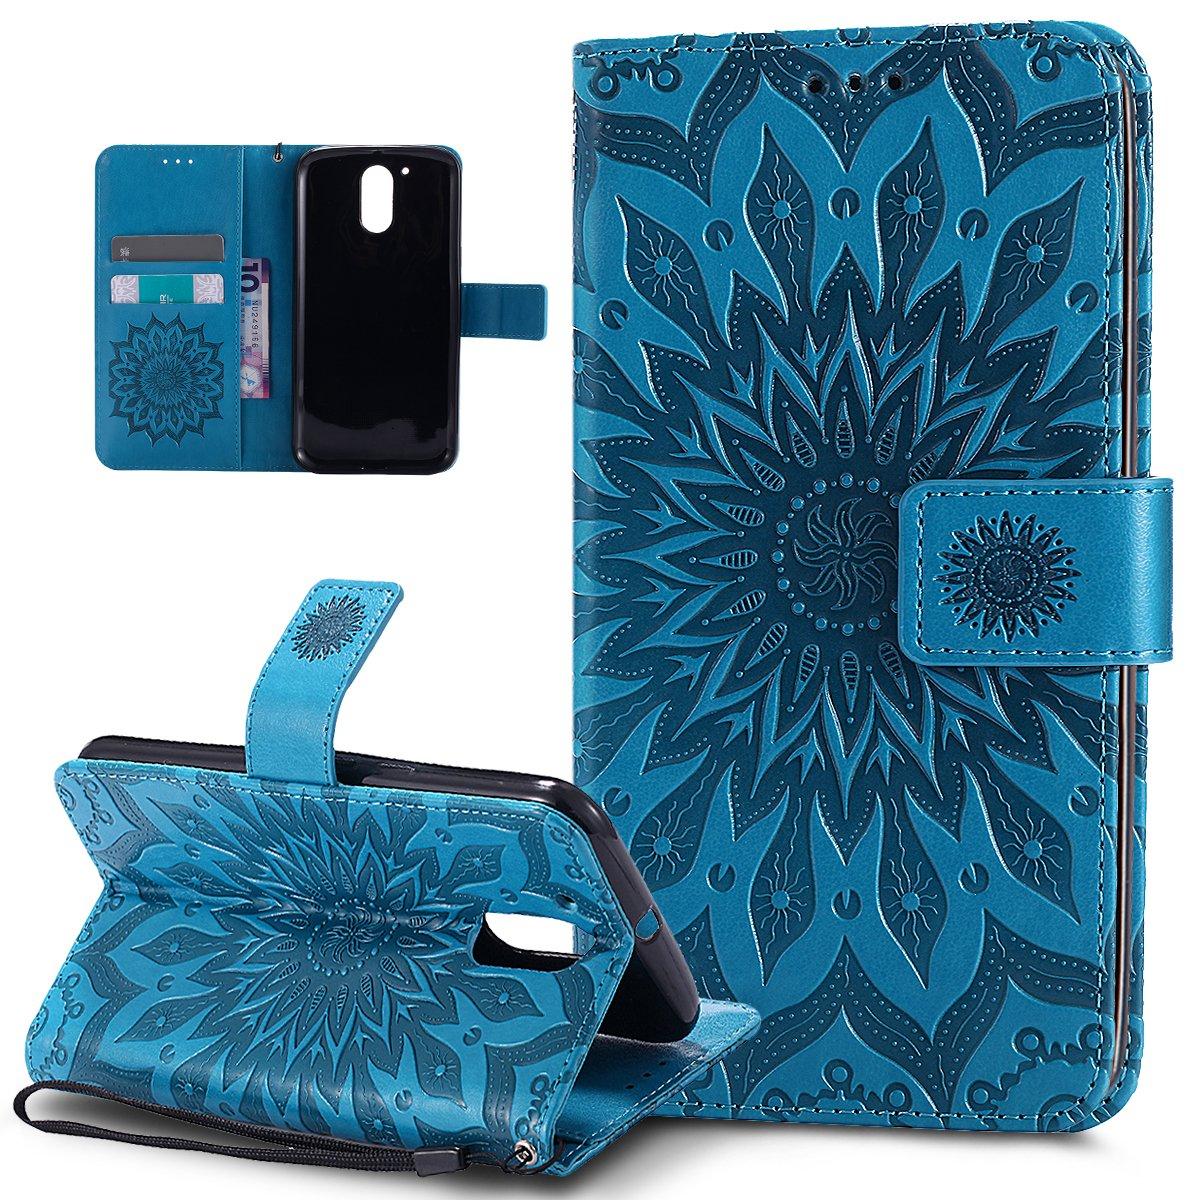 Motorola Moto G4 Hü lle, Motorola Moto G4 Plus Hü lle, Prä gung Mandala Blumen Sonnenblume Muster PU Lederhü lle Flip Hü lle Cover Stä nder Wallet Tasche Case Schutzhü lle fü r Motorola Moto G4/G4 Plus, Grau ikasus